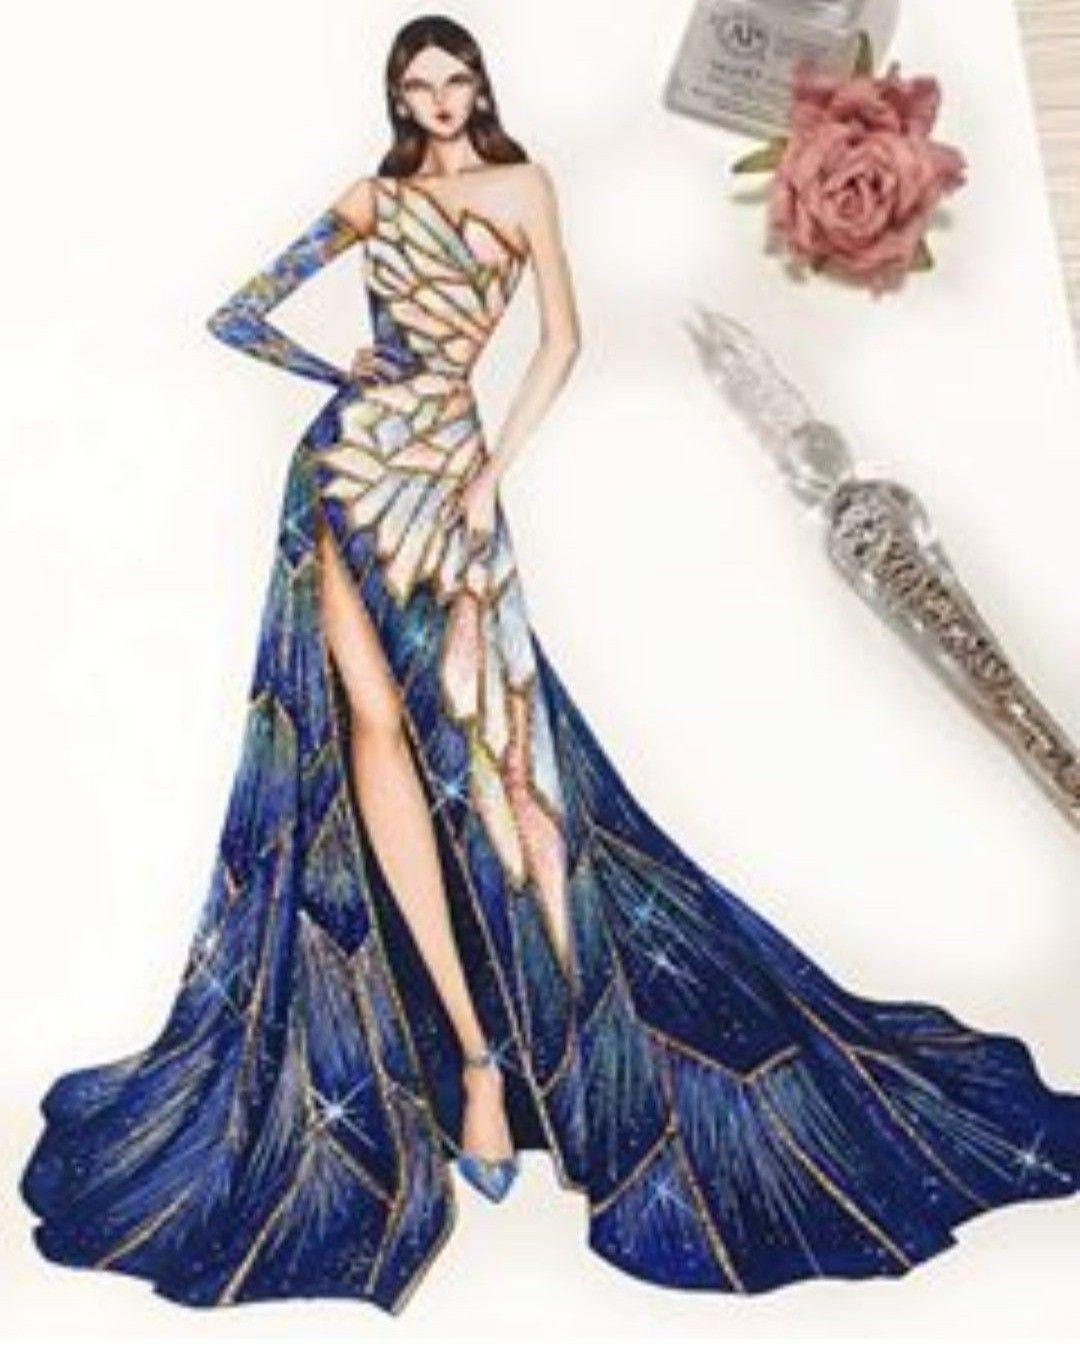 Pin By Dana Popovici On Women S Fashion Fashion Drawing Dresses Fashion Illustration Dresses Fashion Illustration Sketches Dresses